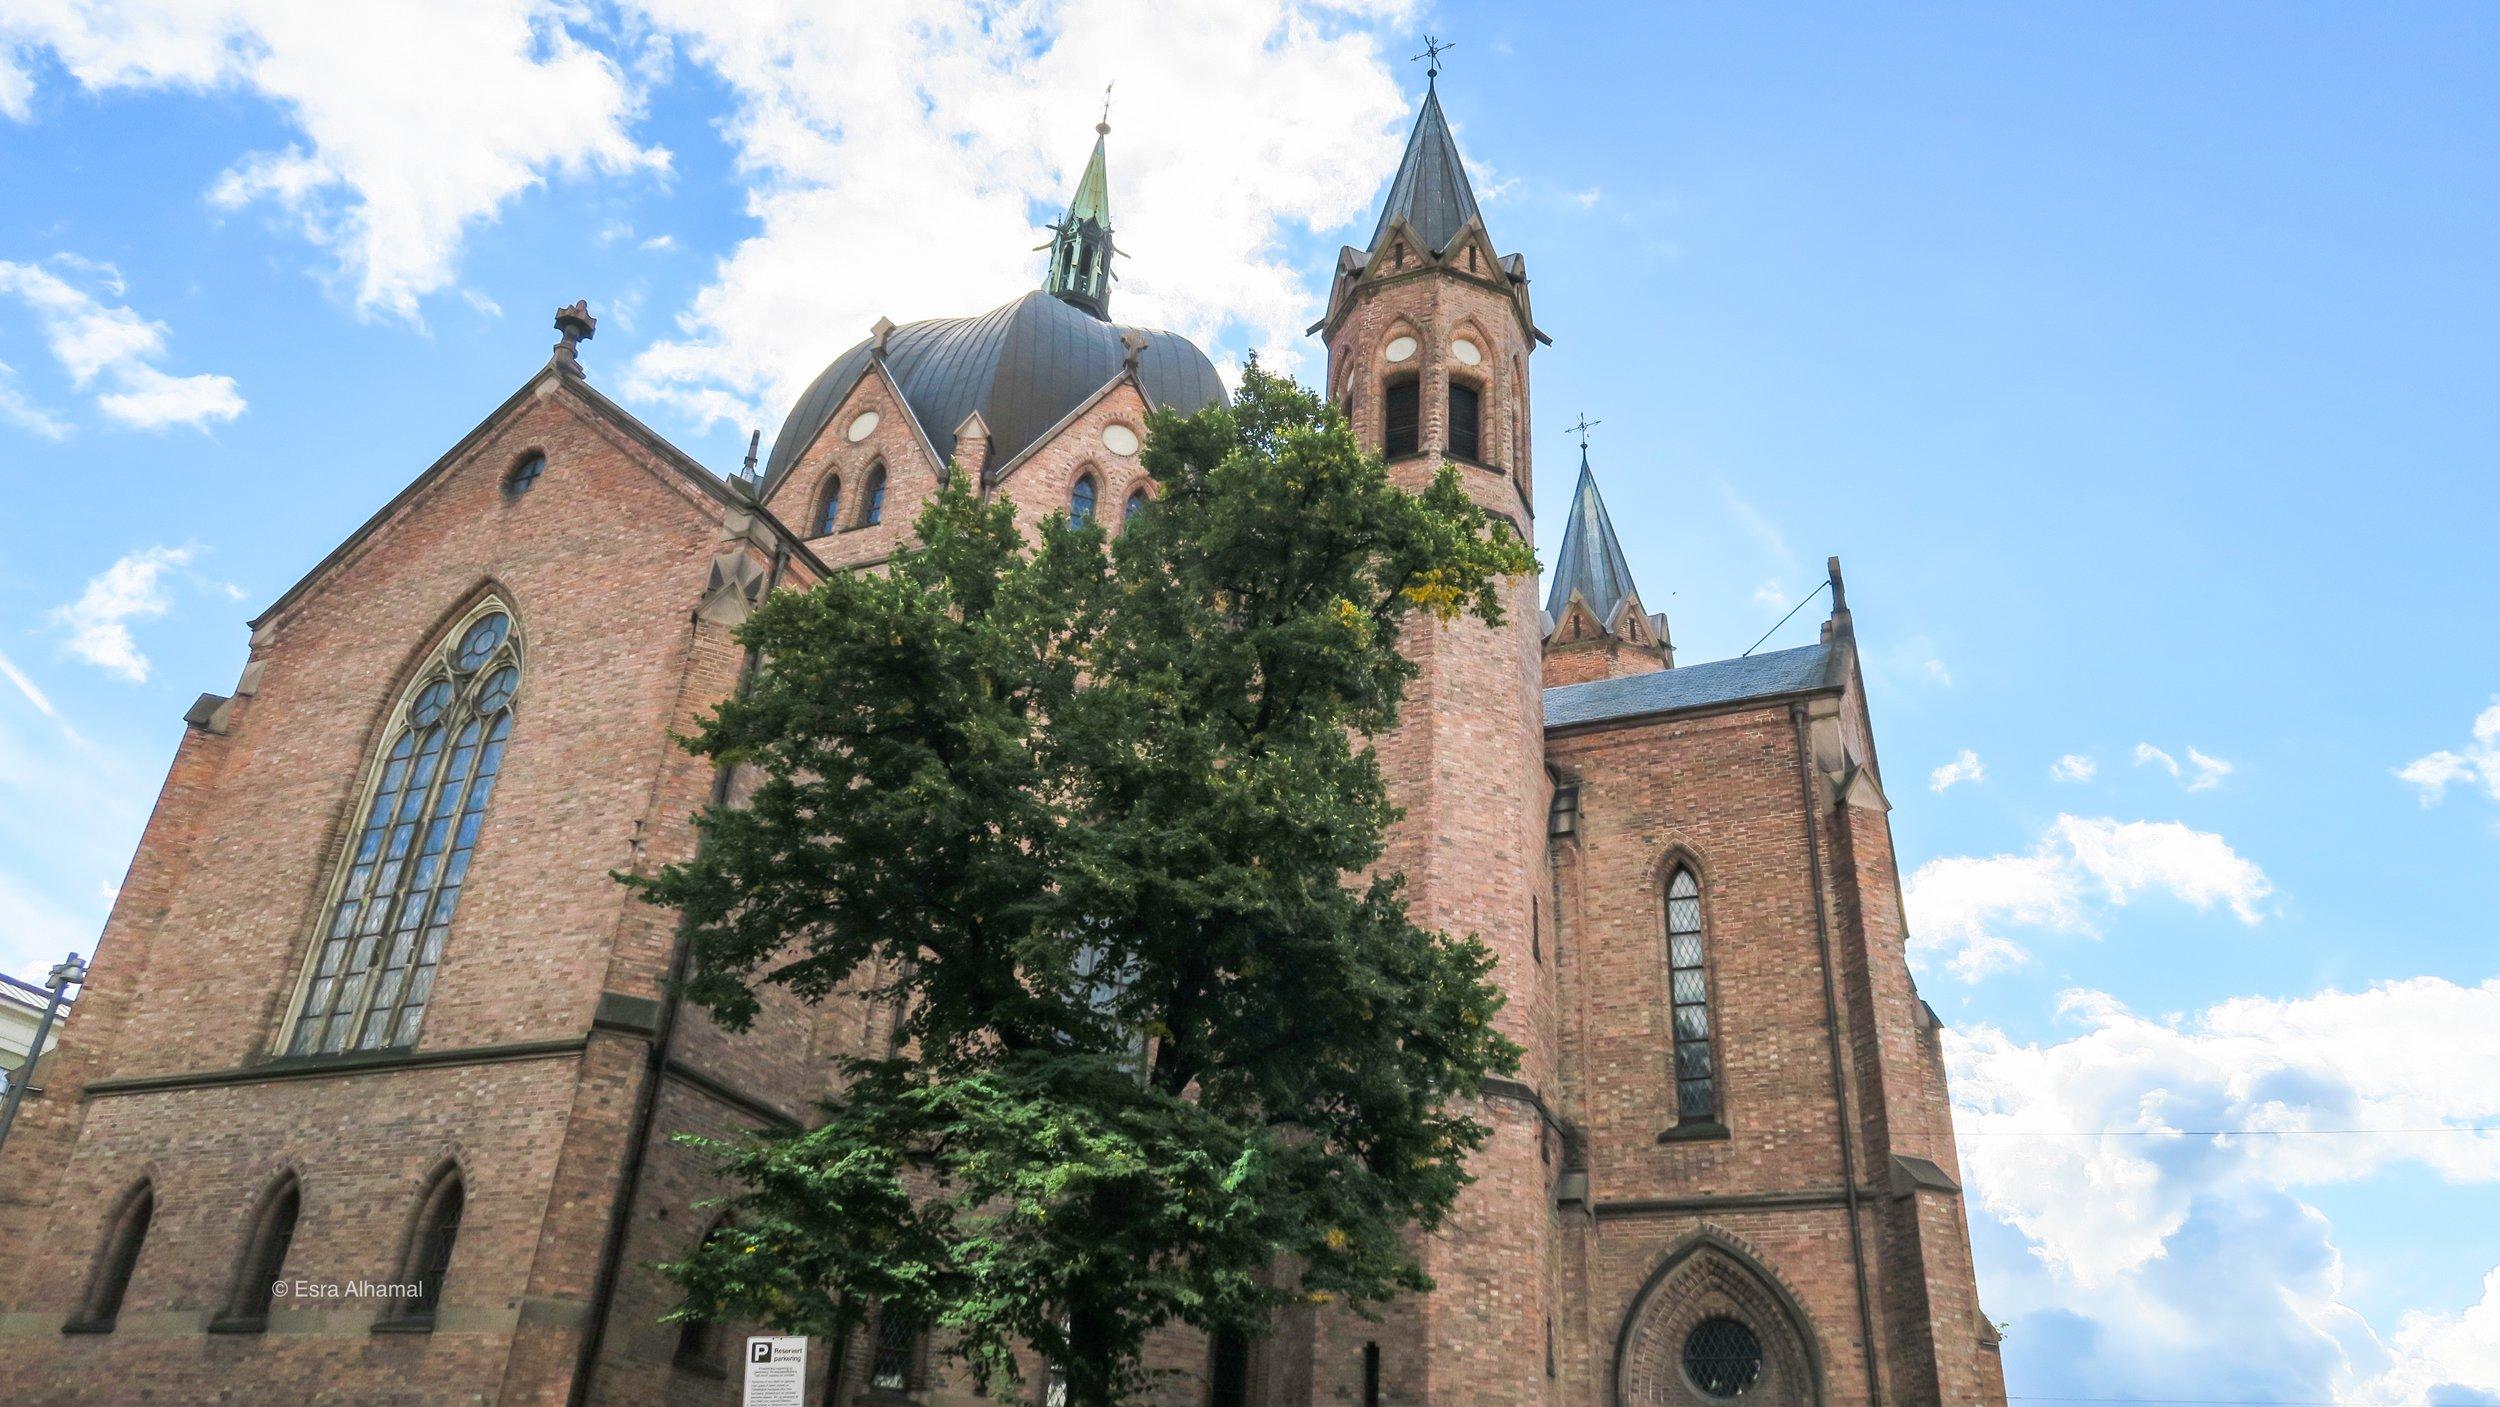 Church in Oslo